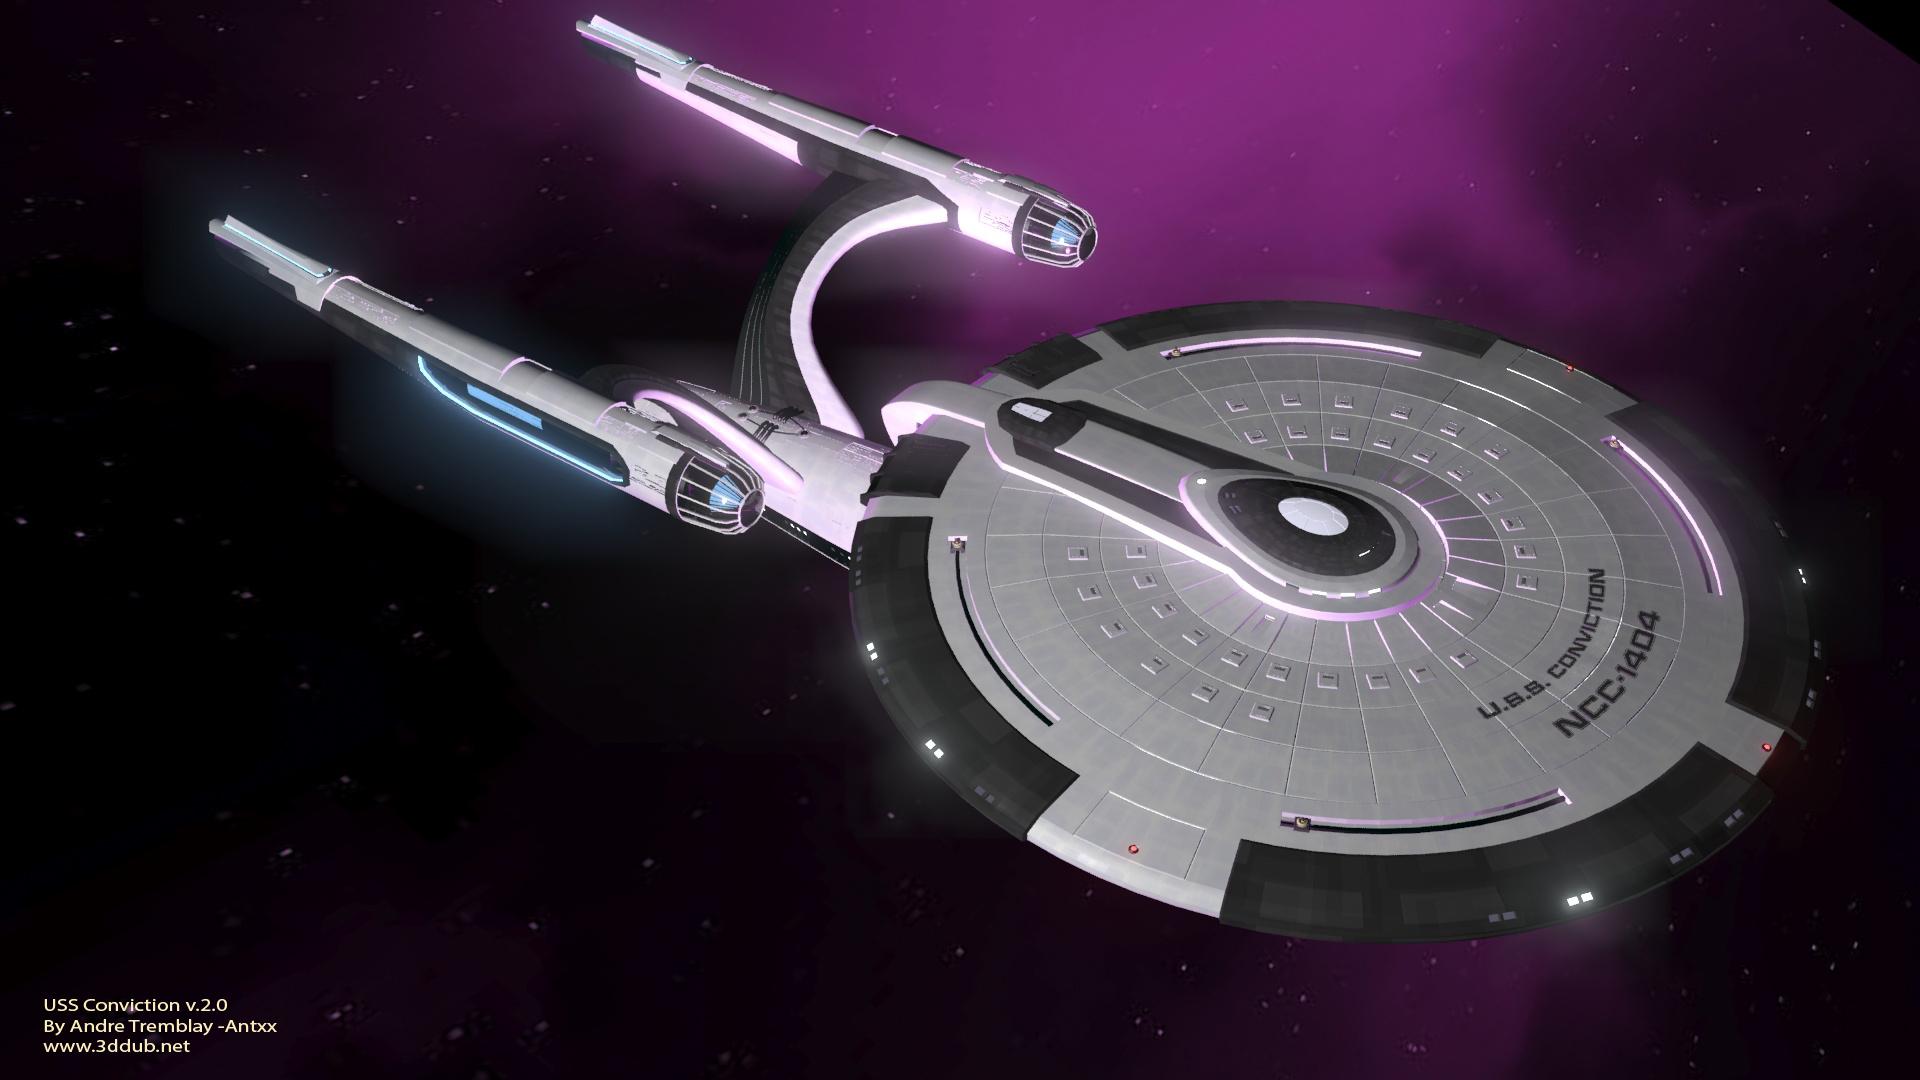 USS Conviction version 2.0